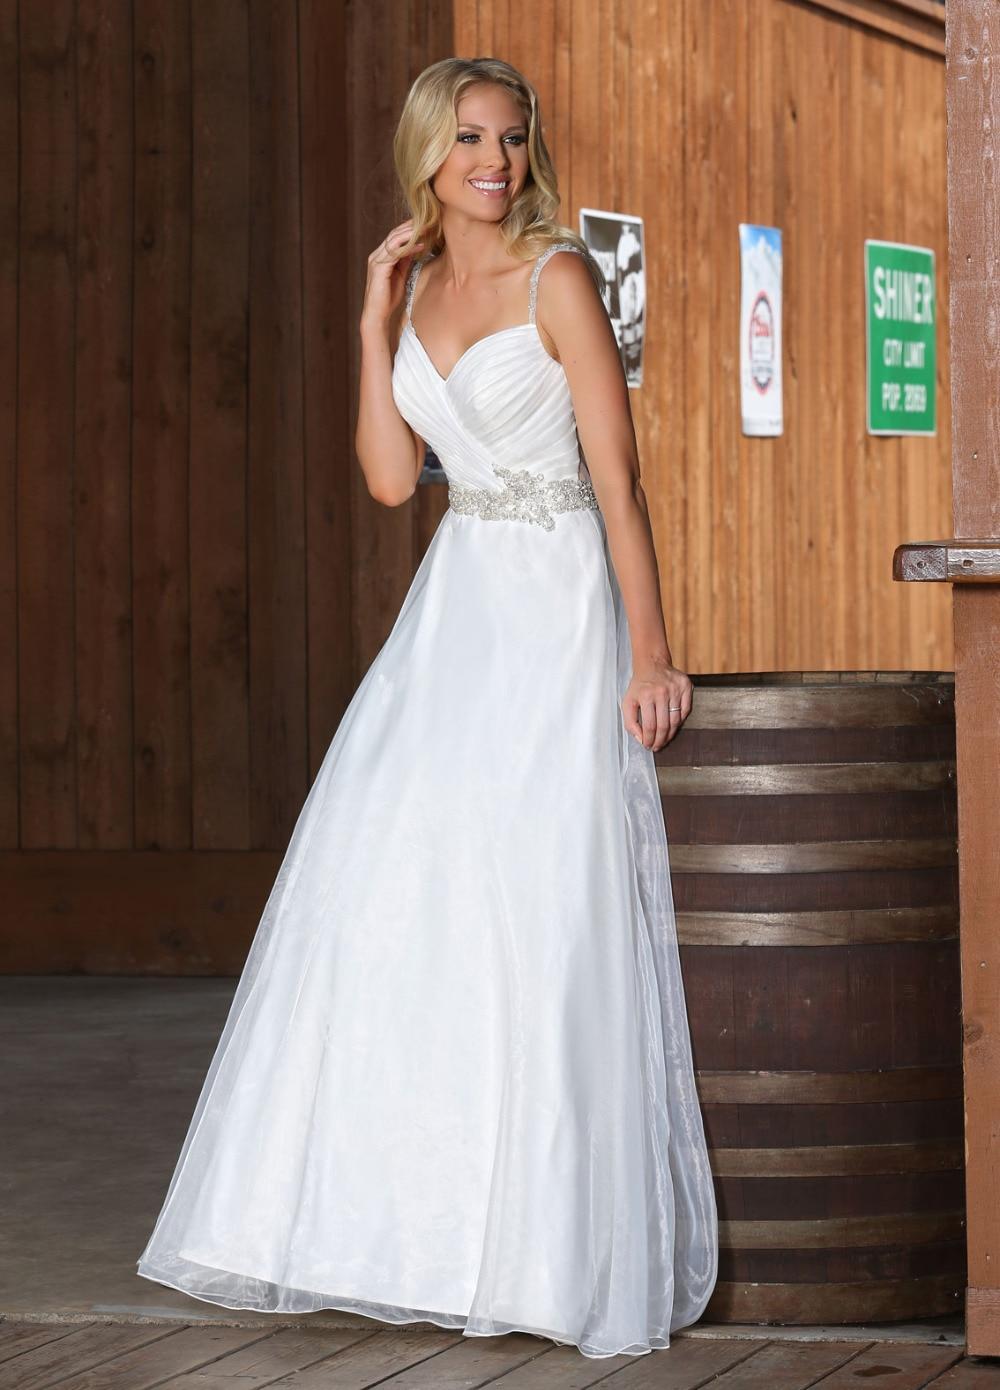 Cheap Wedding Dresses 75 wedding dresses cheap Deep V Neck Long Sleeves Lace Tulle A Line Wedding Dress affordable Wedding